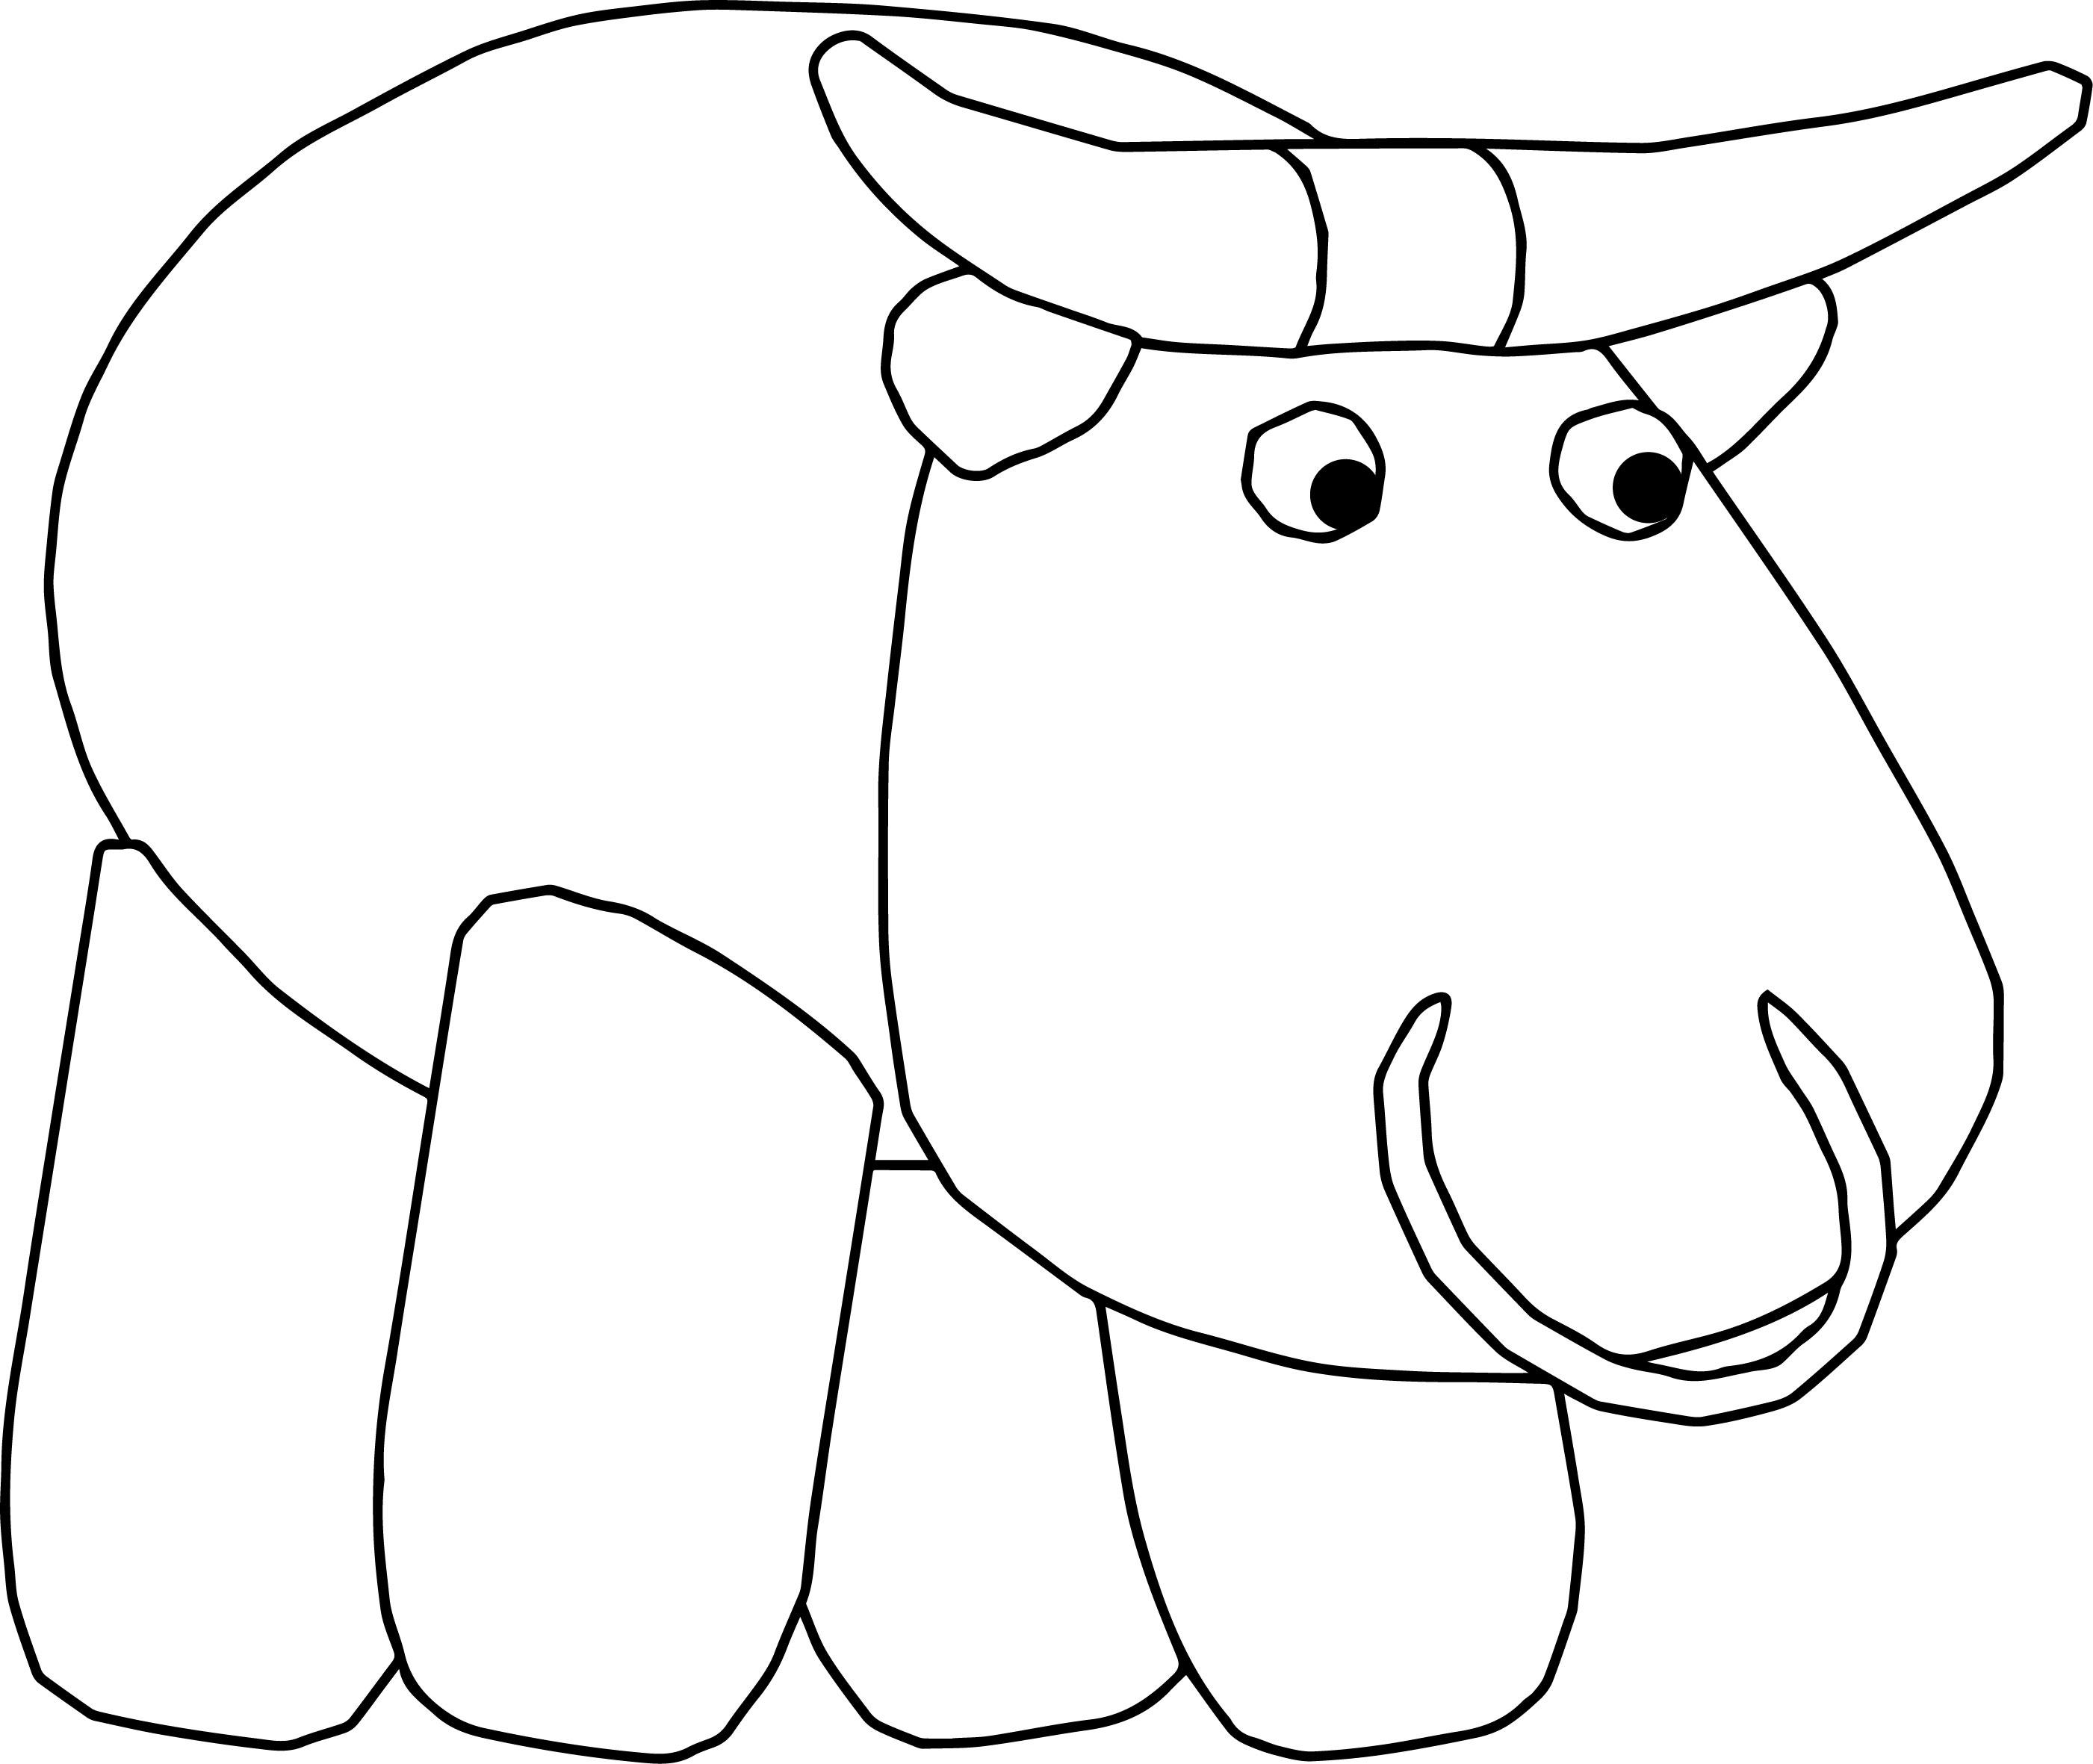 Bull Cartoon Coloring Page